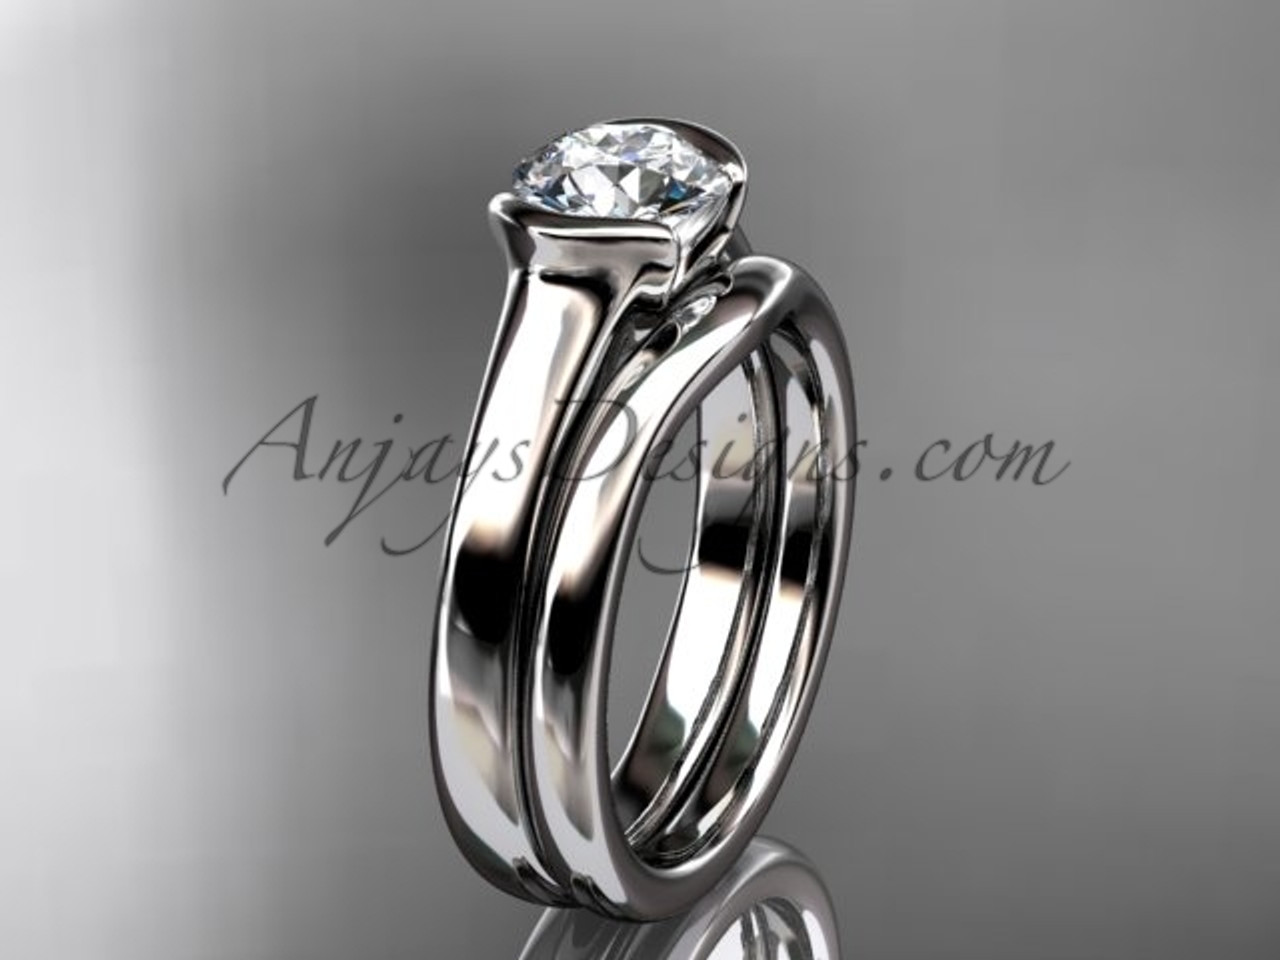 Wedding Ring Sets.Beautiful Engagement Rings 14kt White Gold Wedding Ring Set Vd10016s